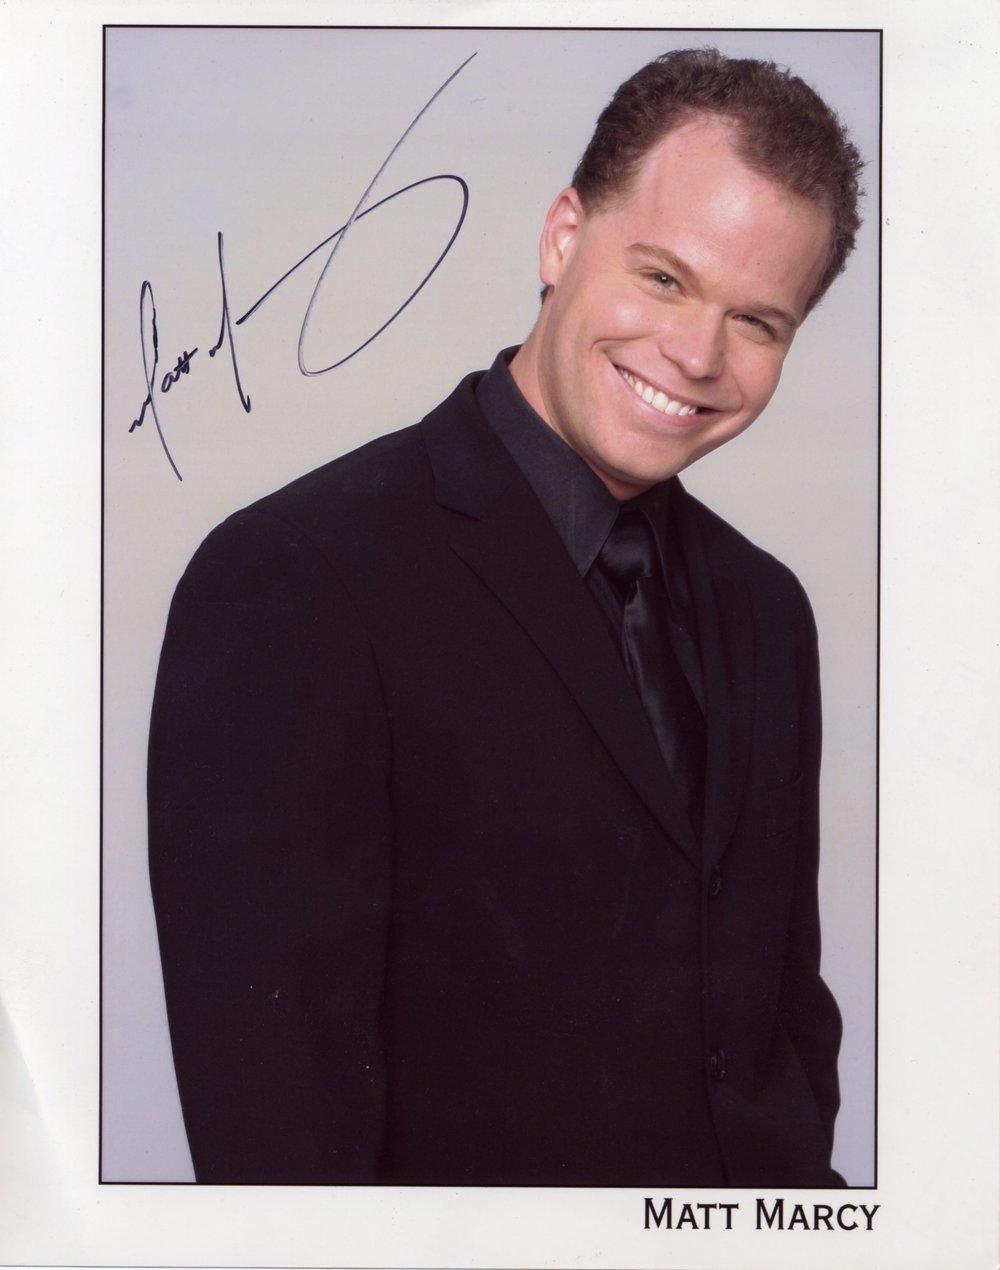 Matt-Marcy-Autograph.jpg